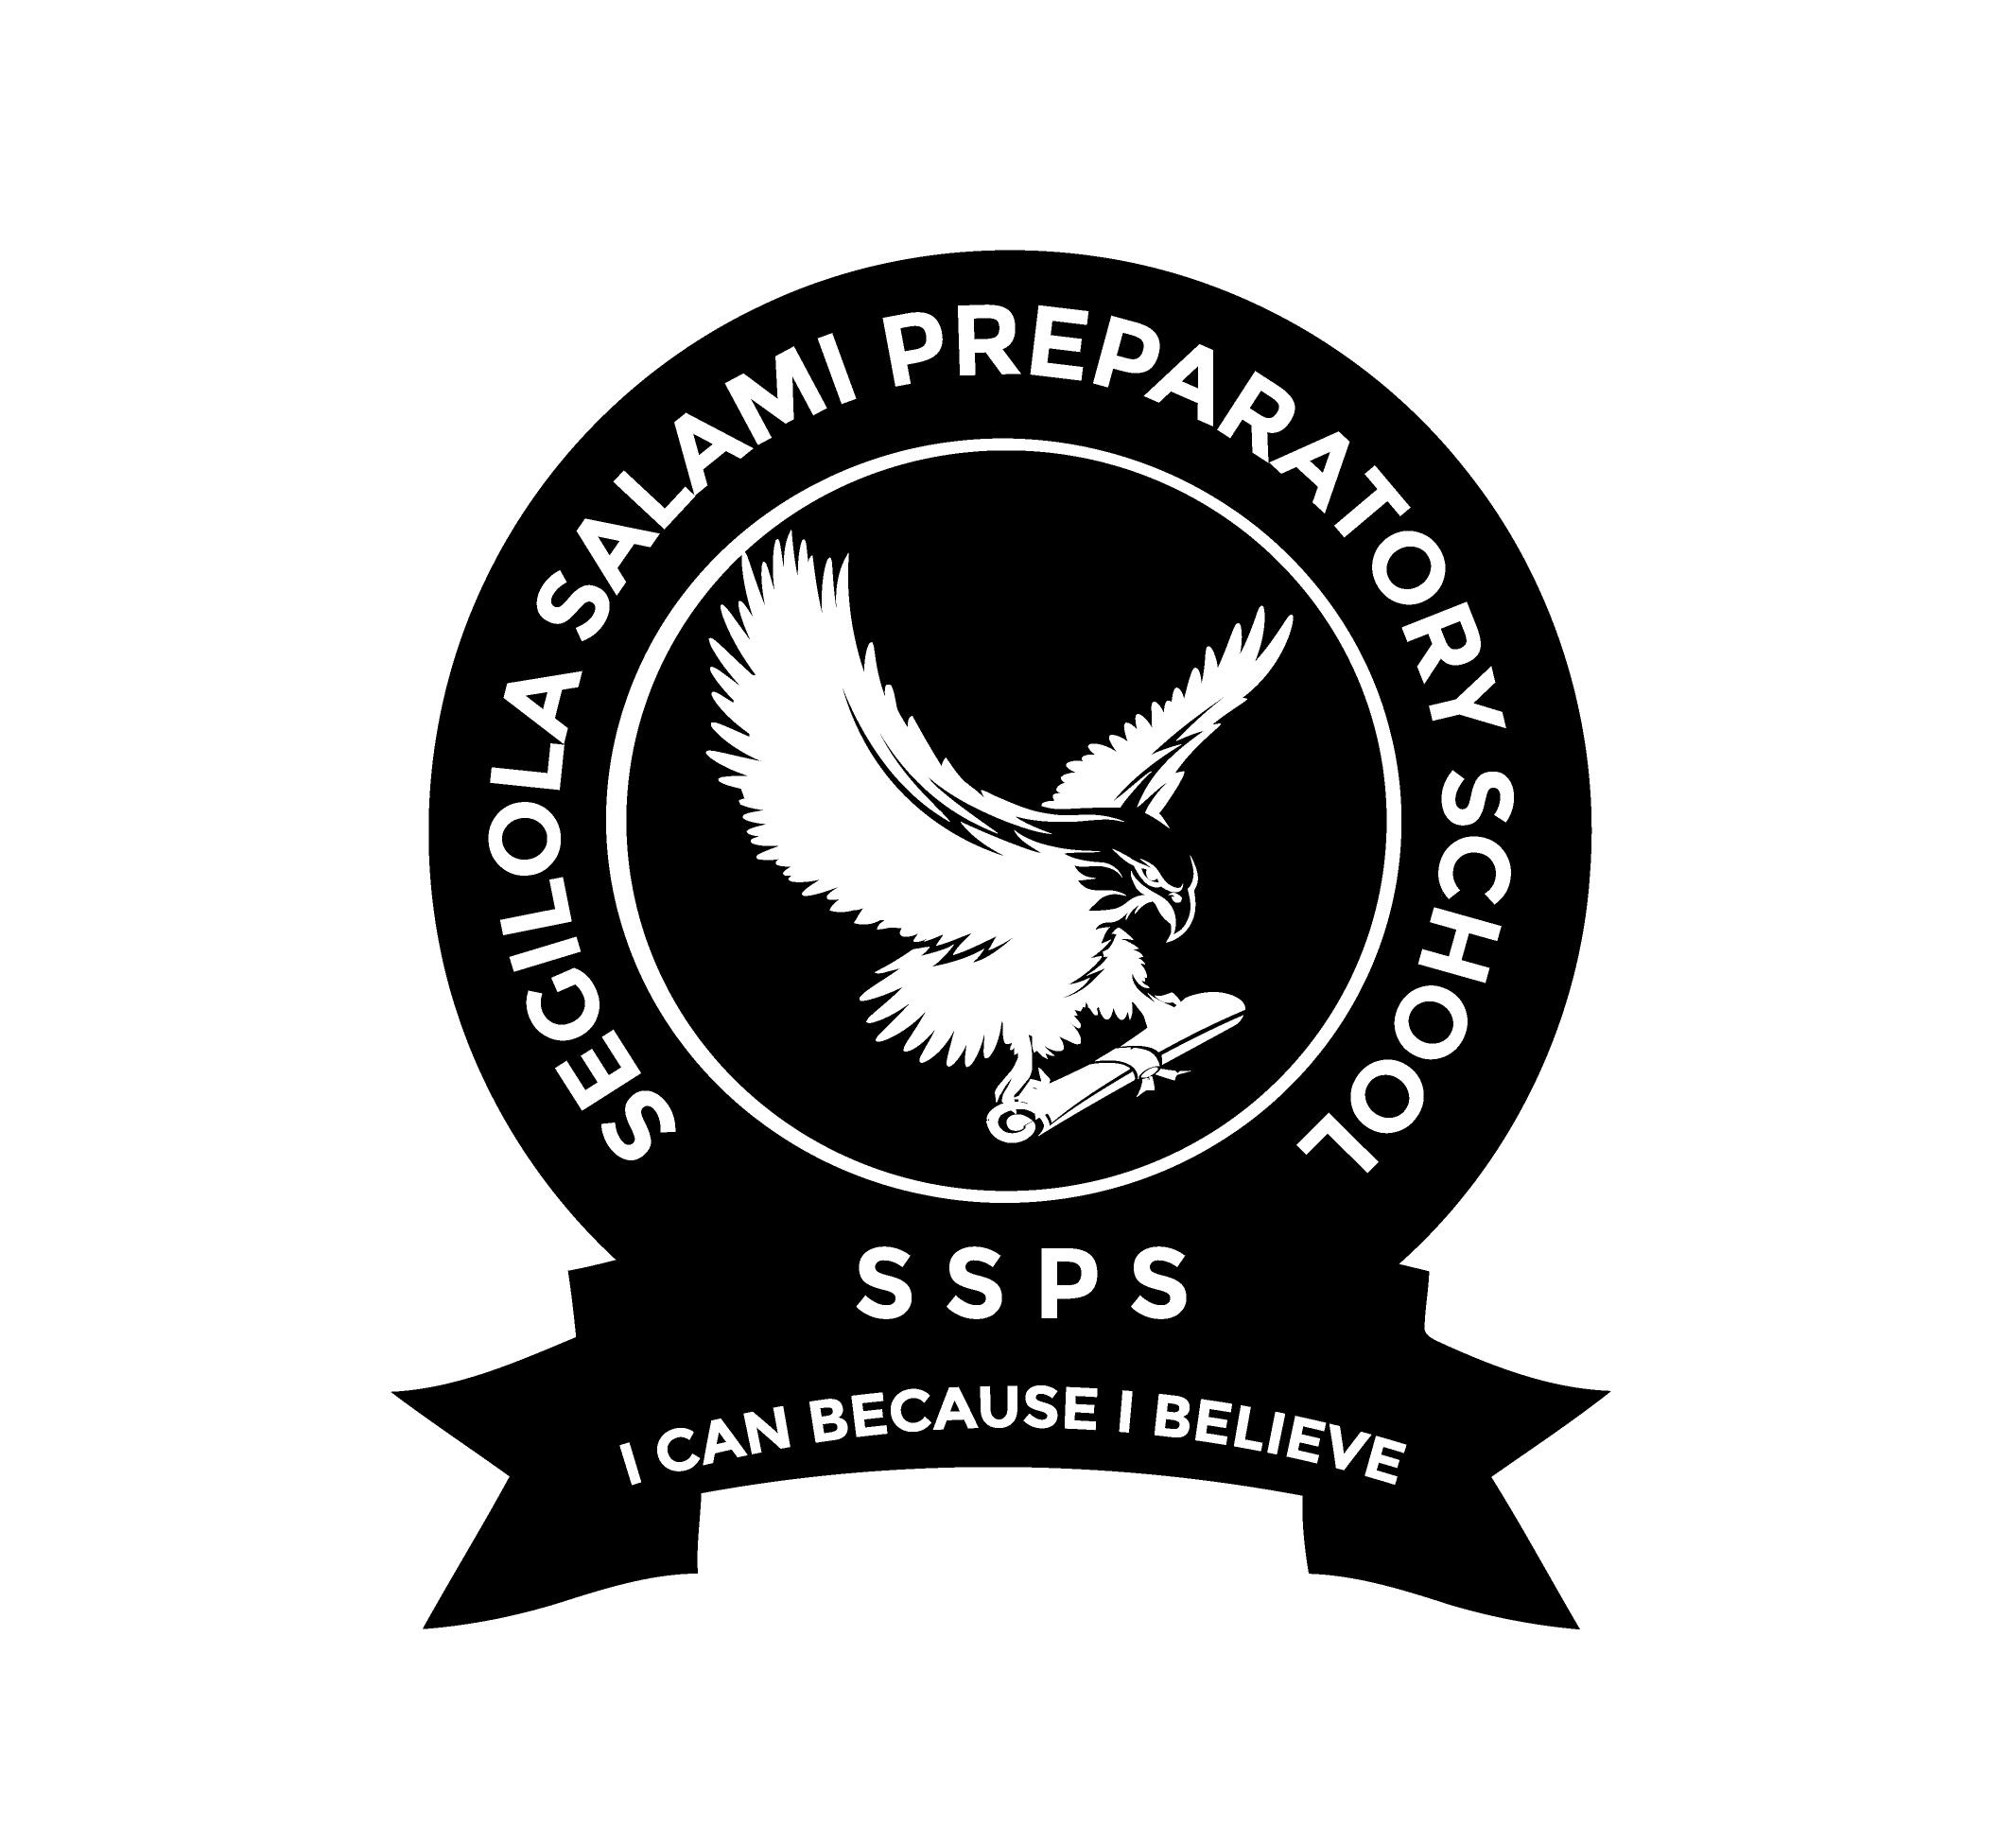 Segilola Salami Preparatory School